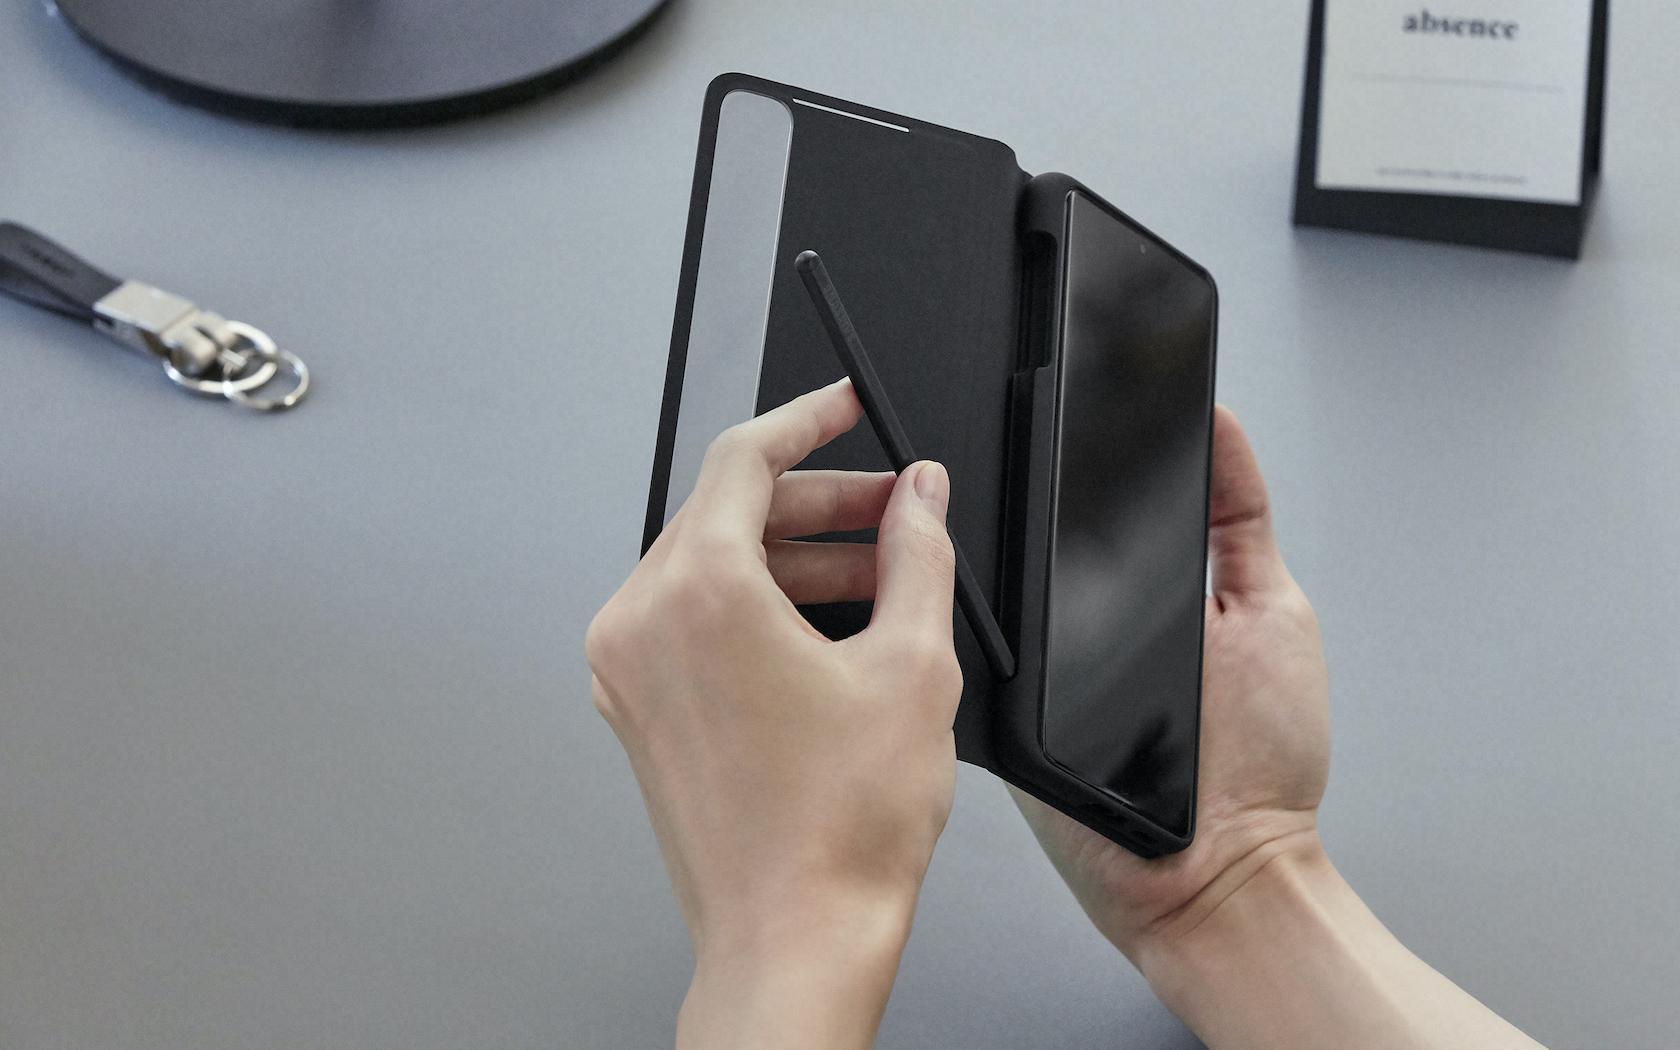 Samsung Galaxy S22 Ultra: Θα έχει εσωματωμένο S-Pen